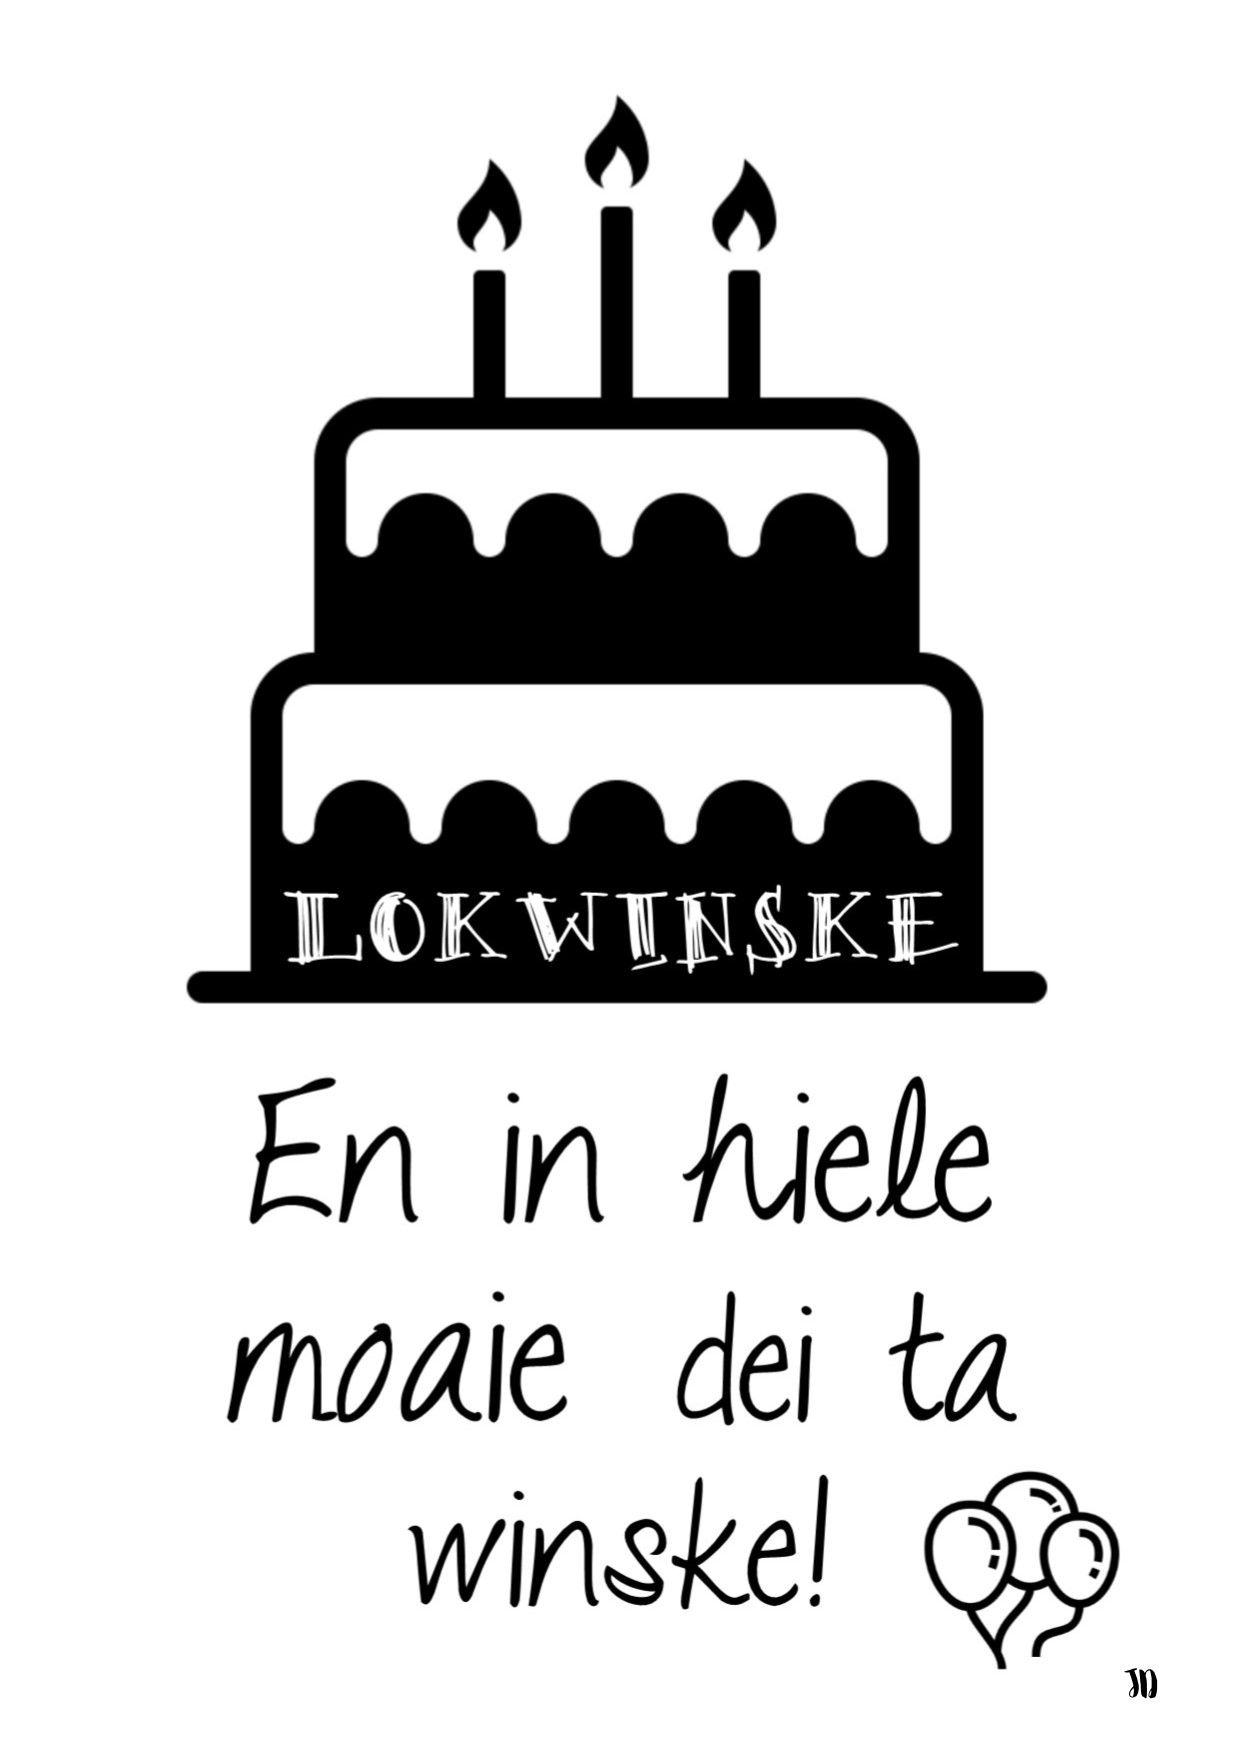 Jierdei lokwinske Frysk kaart printable verjaardag Frysk t